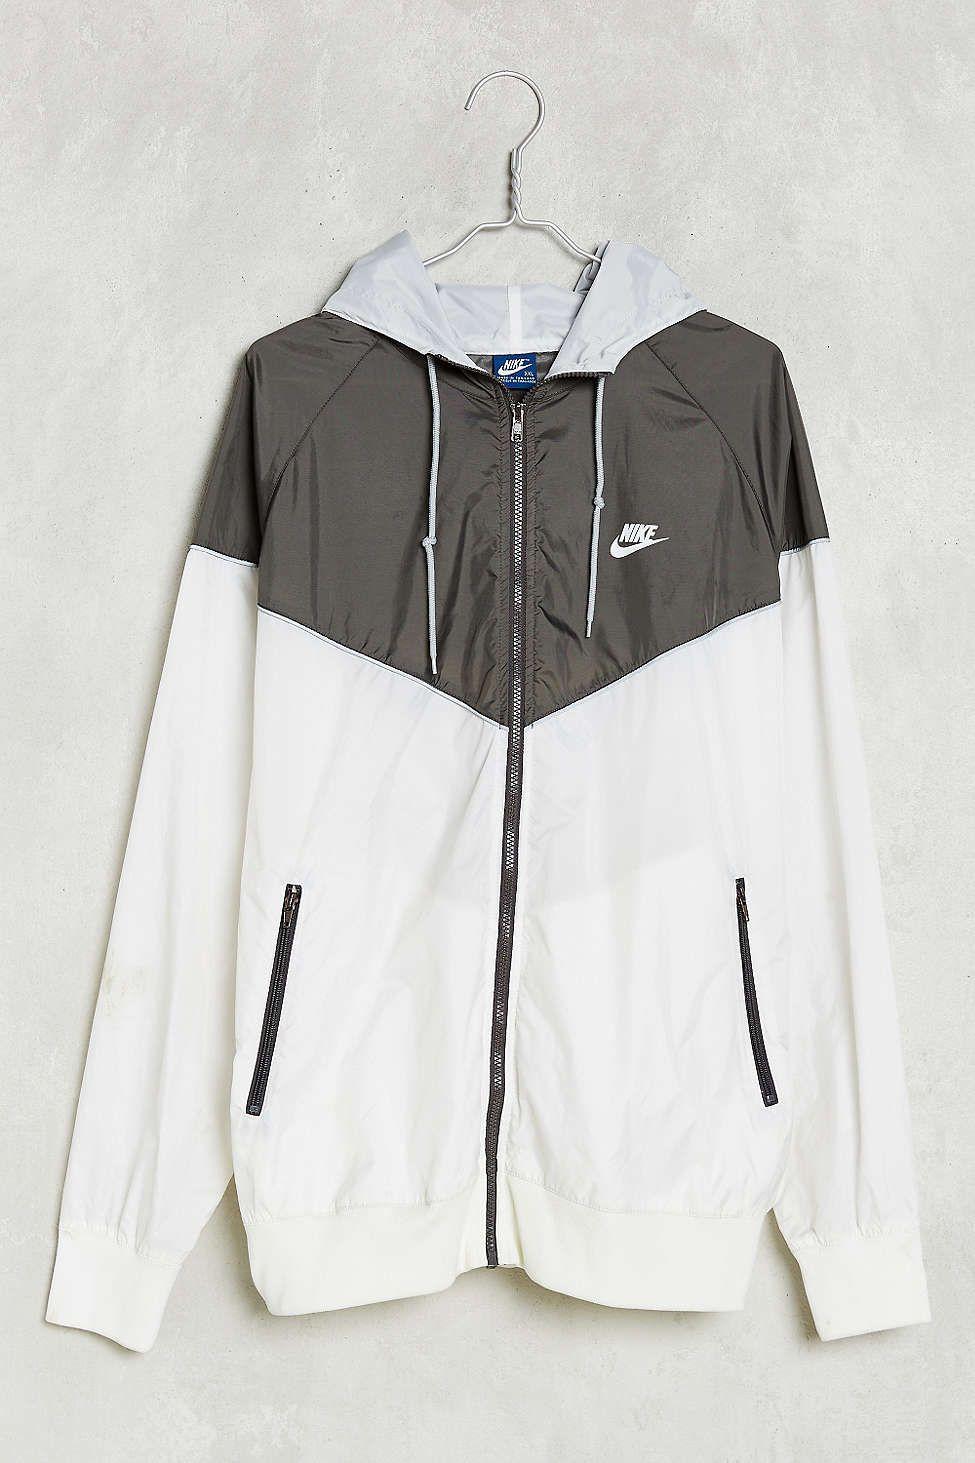 Nike jacket gray and black - Jacket Nike Windbreaker Black And White Blue Withe Black White Coat Nike Live Love Nike Pinterest Dress Shops Skirts And I Love